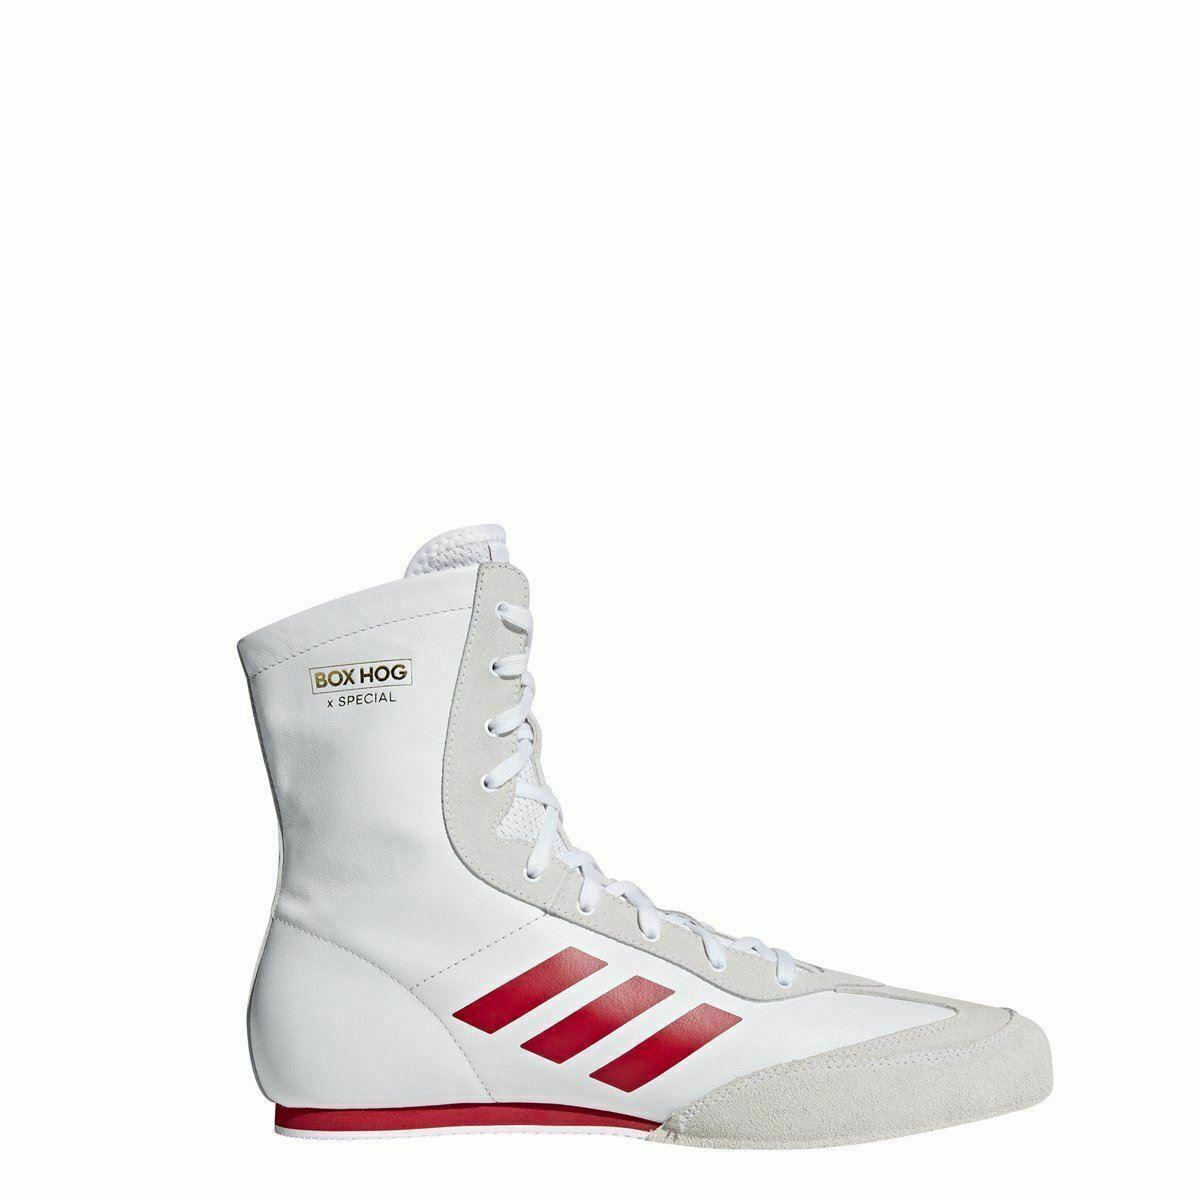 [AC7148] Mens Adidas Box Hog X Special - Boxing shoes Size 11.5